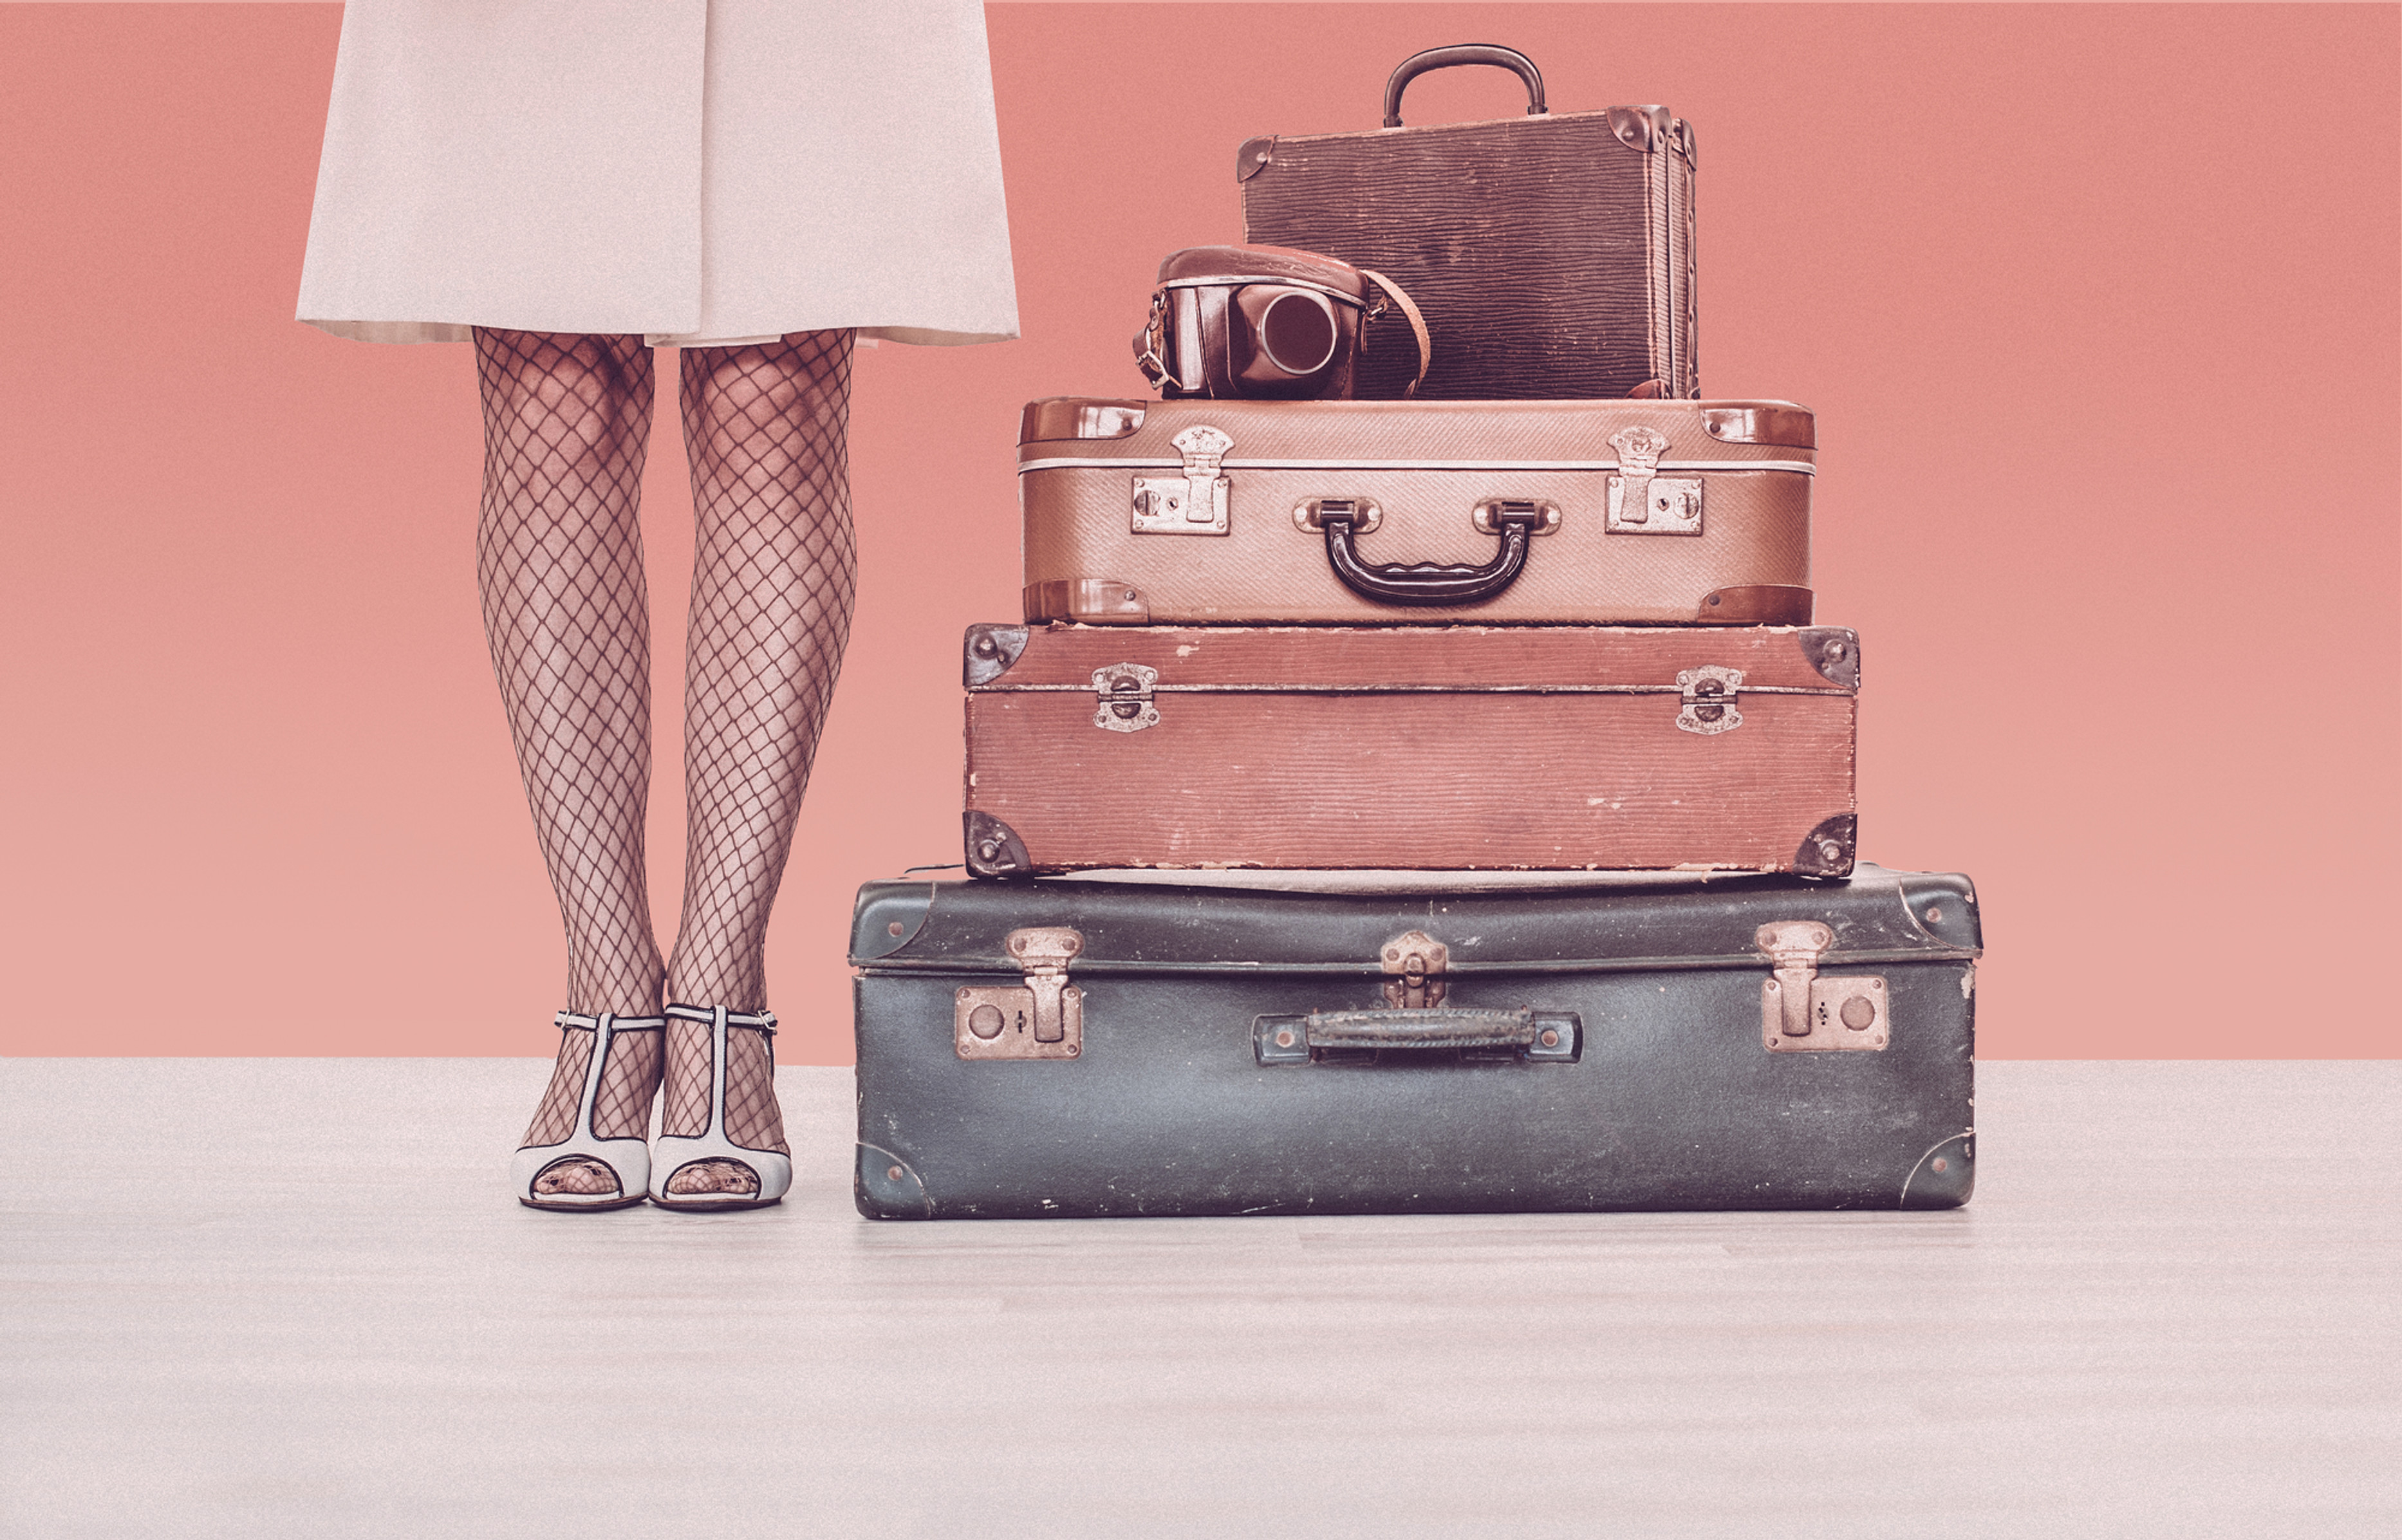 Vacation Shopping & Packing